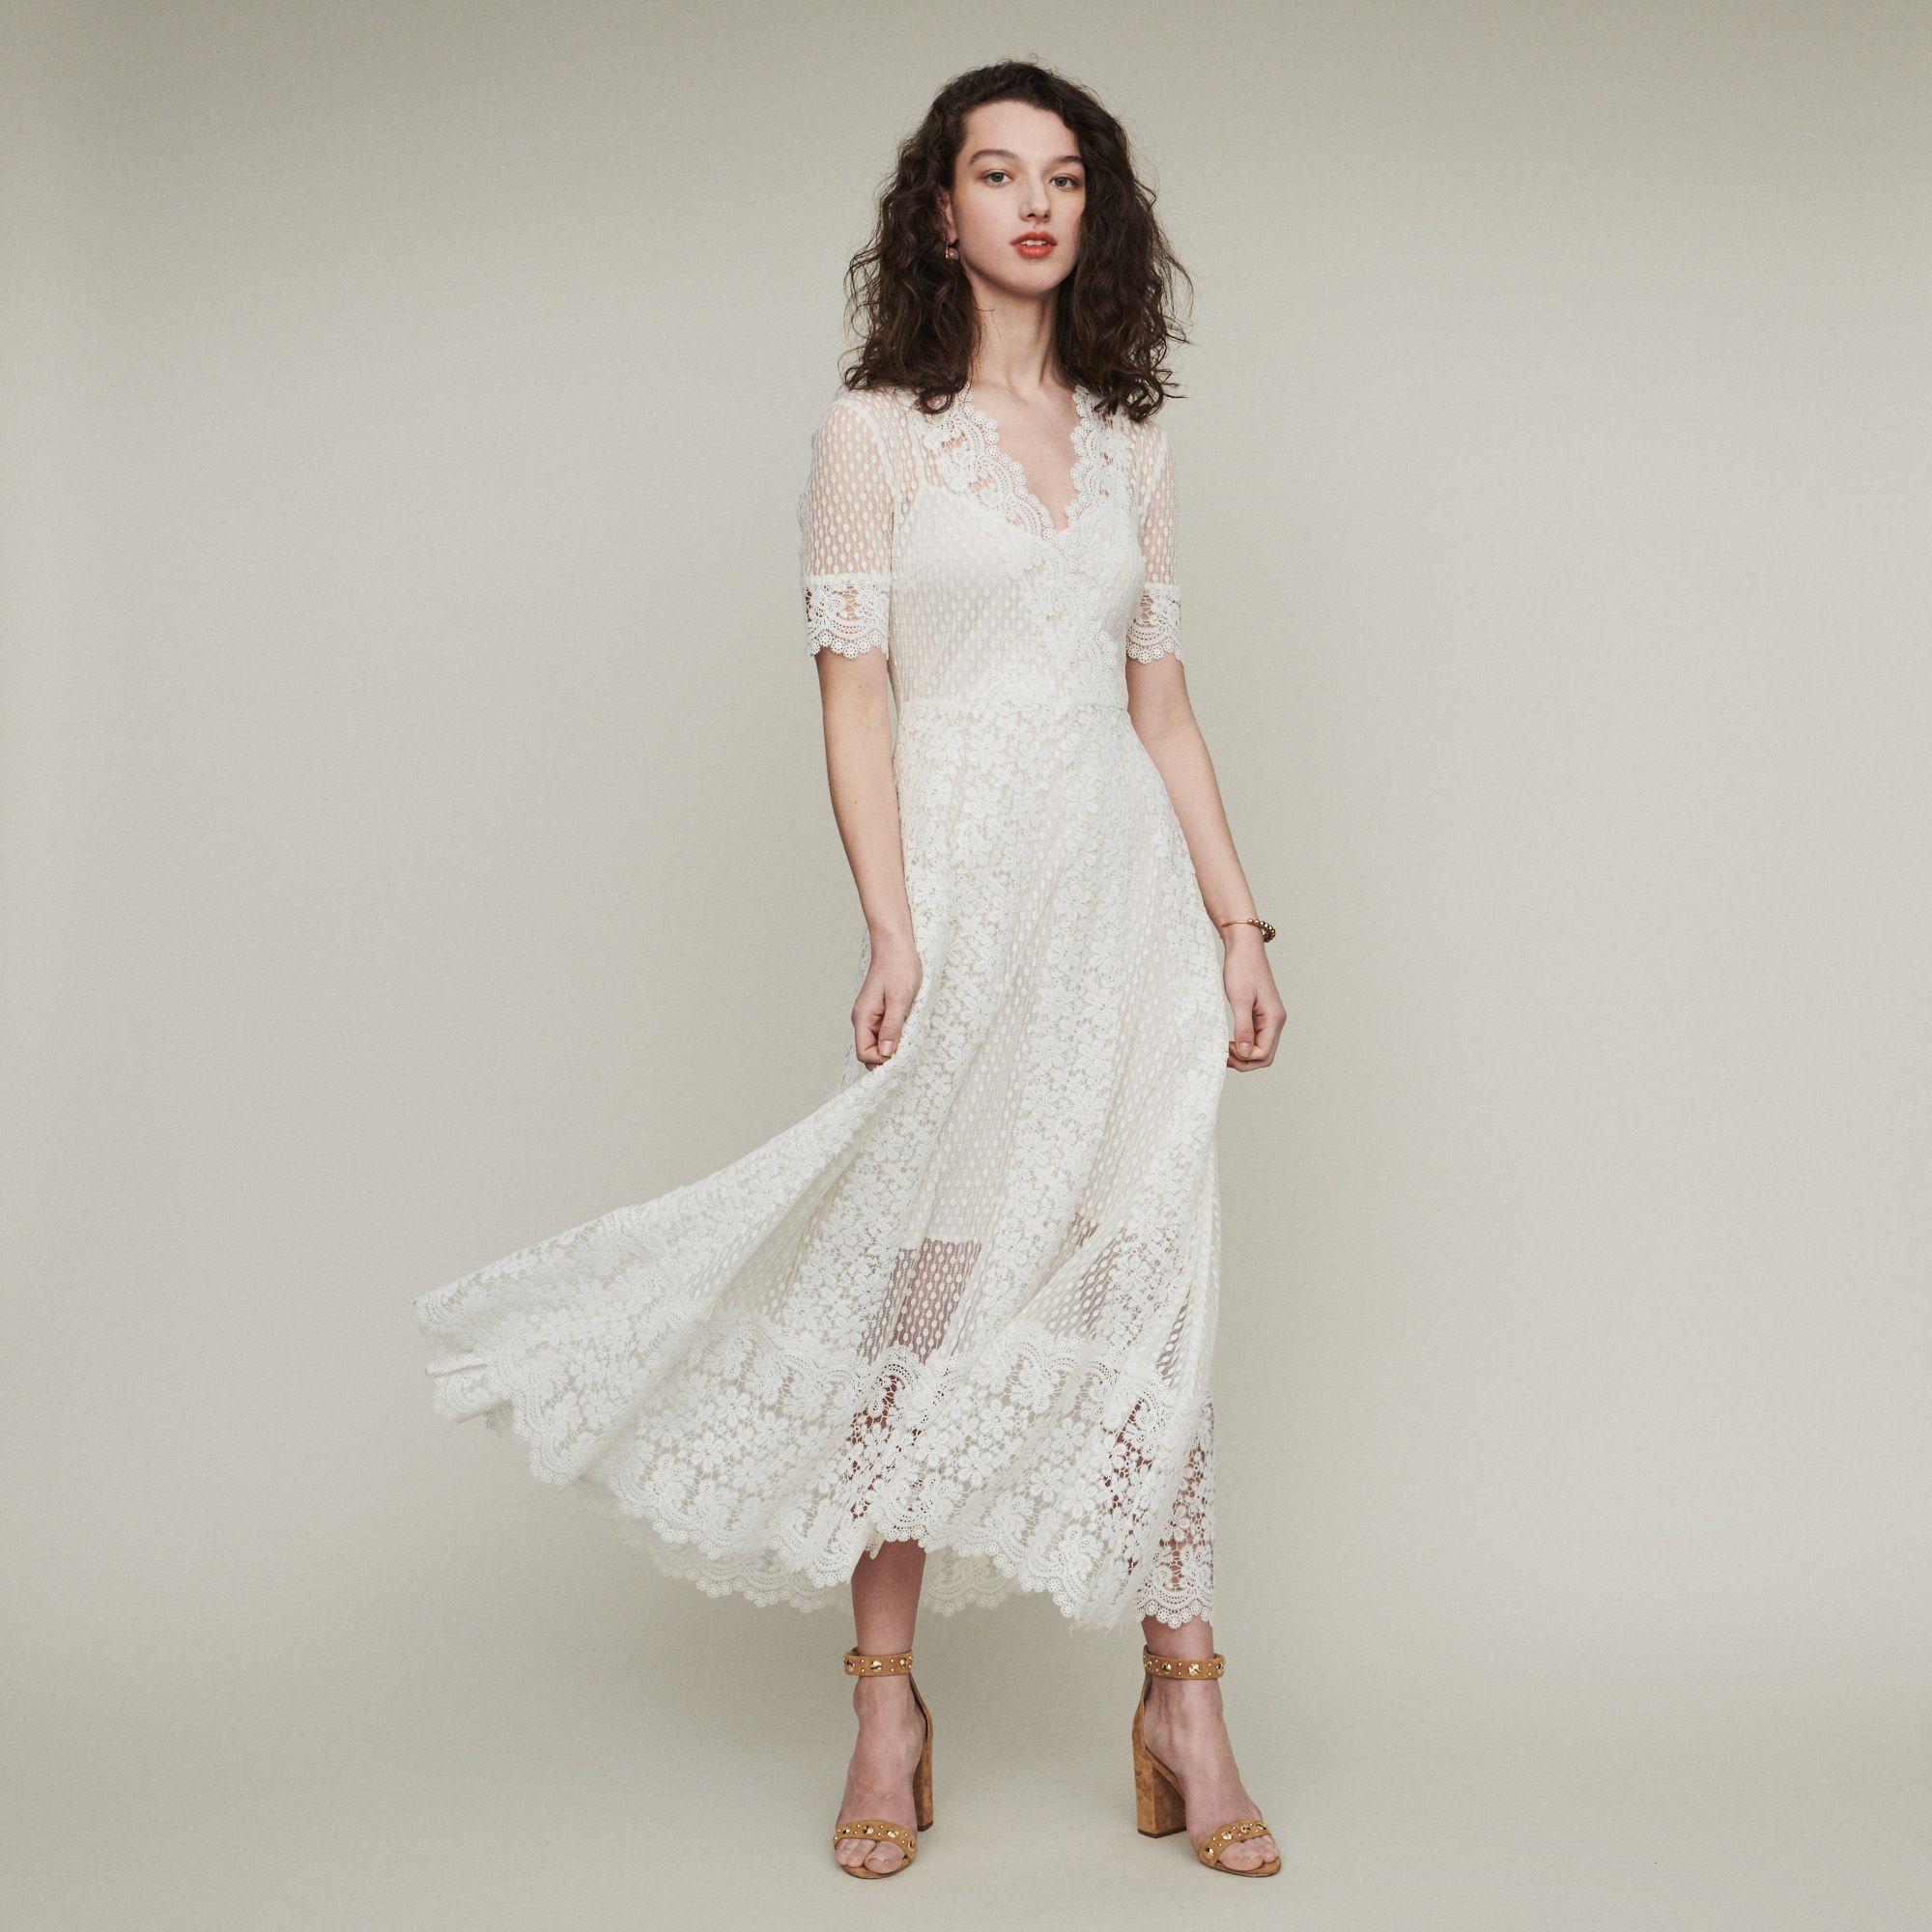 REVANTI Robe longue en plumetis et dentelle | Mariage en